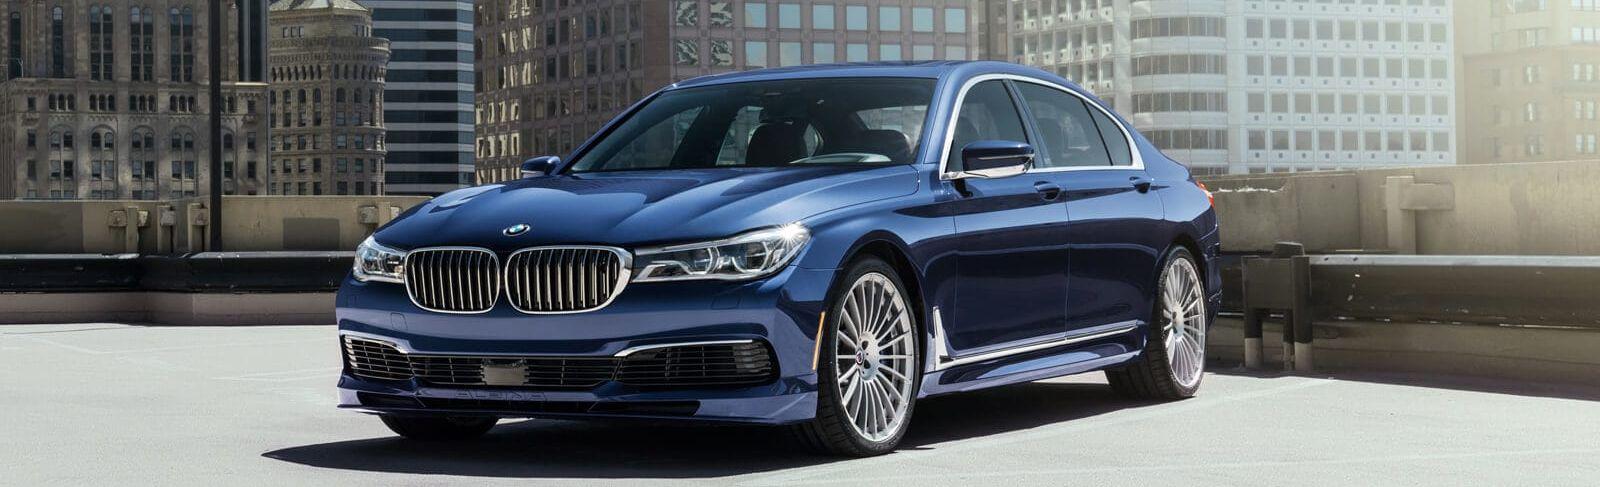 2019 BMW 7 Series Leasing near Dallas, TX